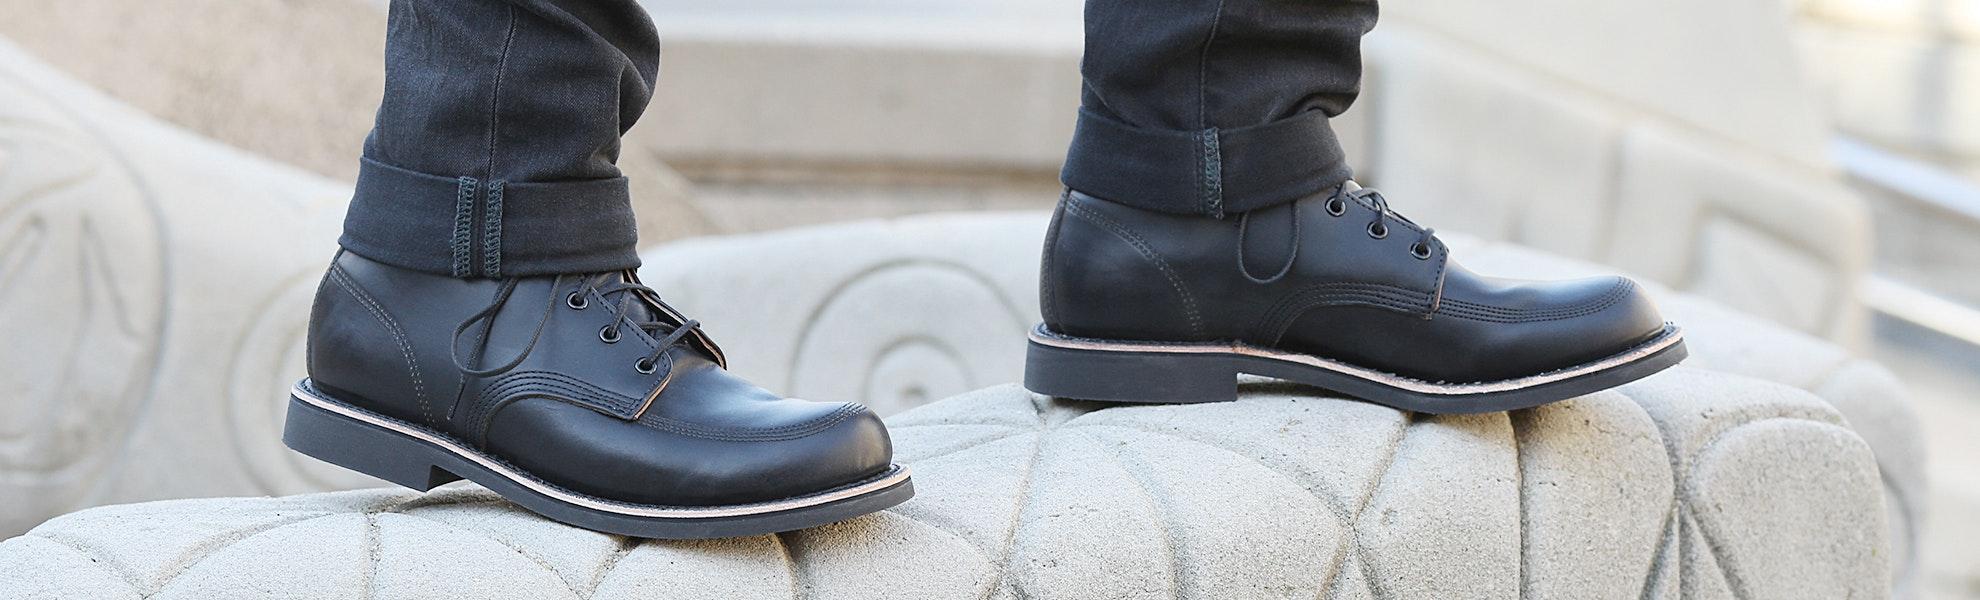 Thorogood 1892 Mondovi Boots